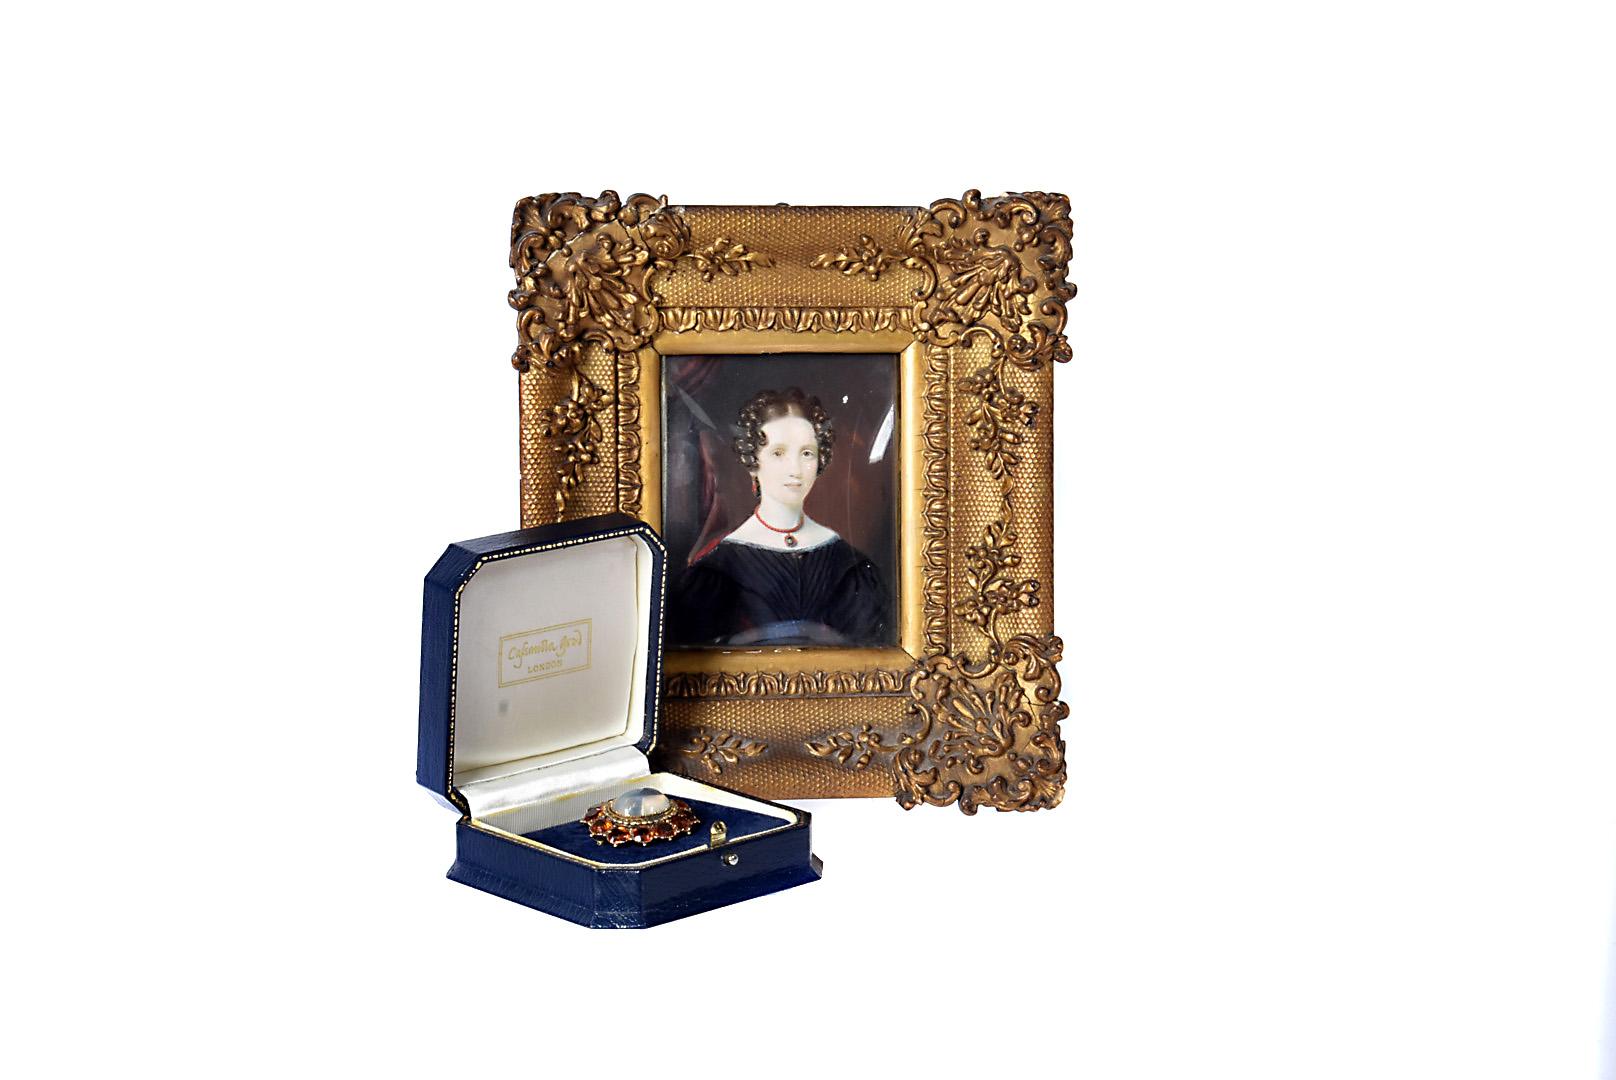 Anna Theresa Stalker (1805-1890), relative of Major General Foster Stalker, hand painted portrait on